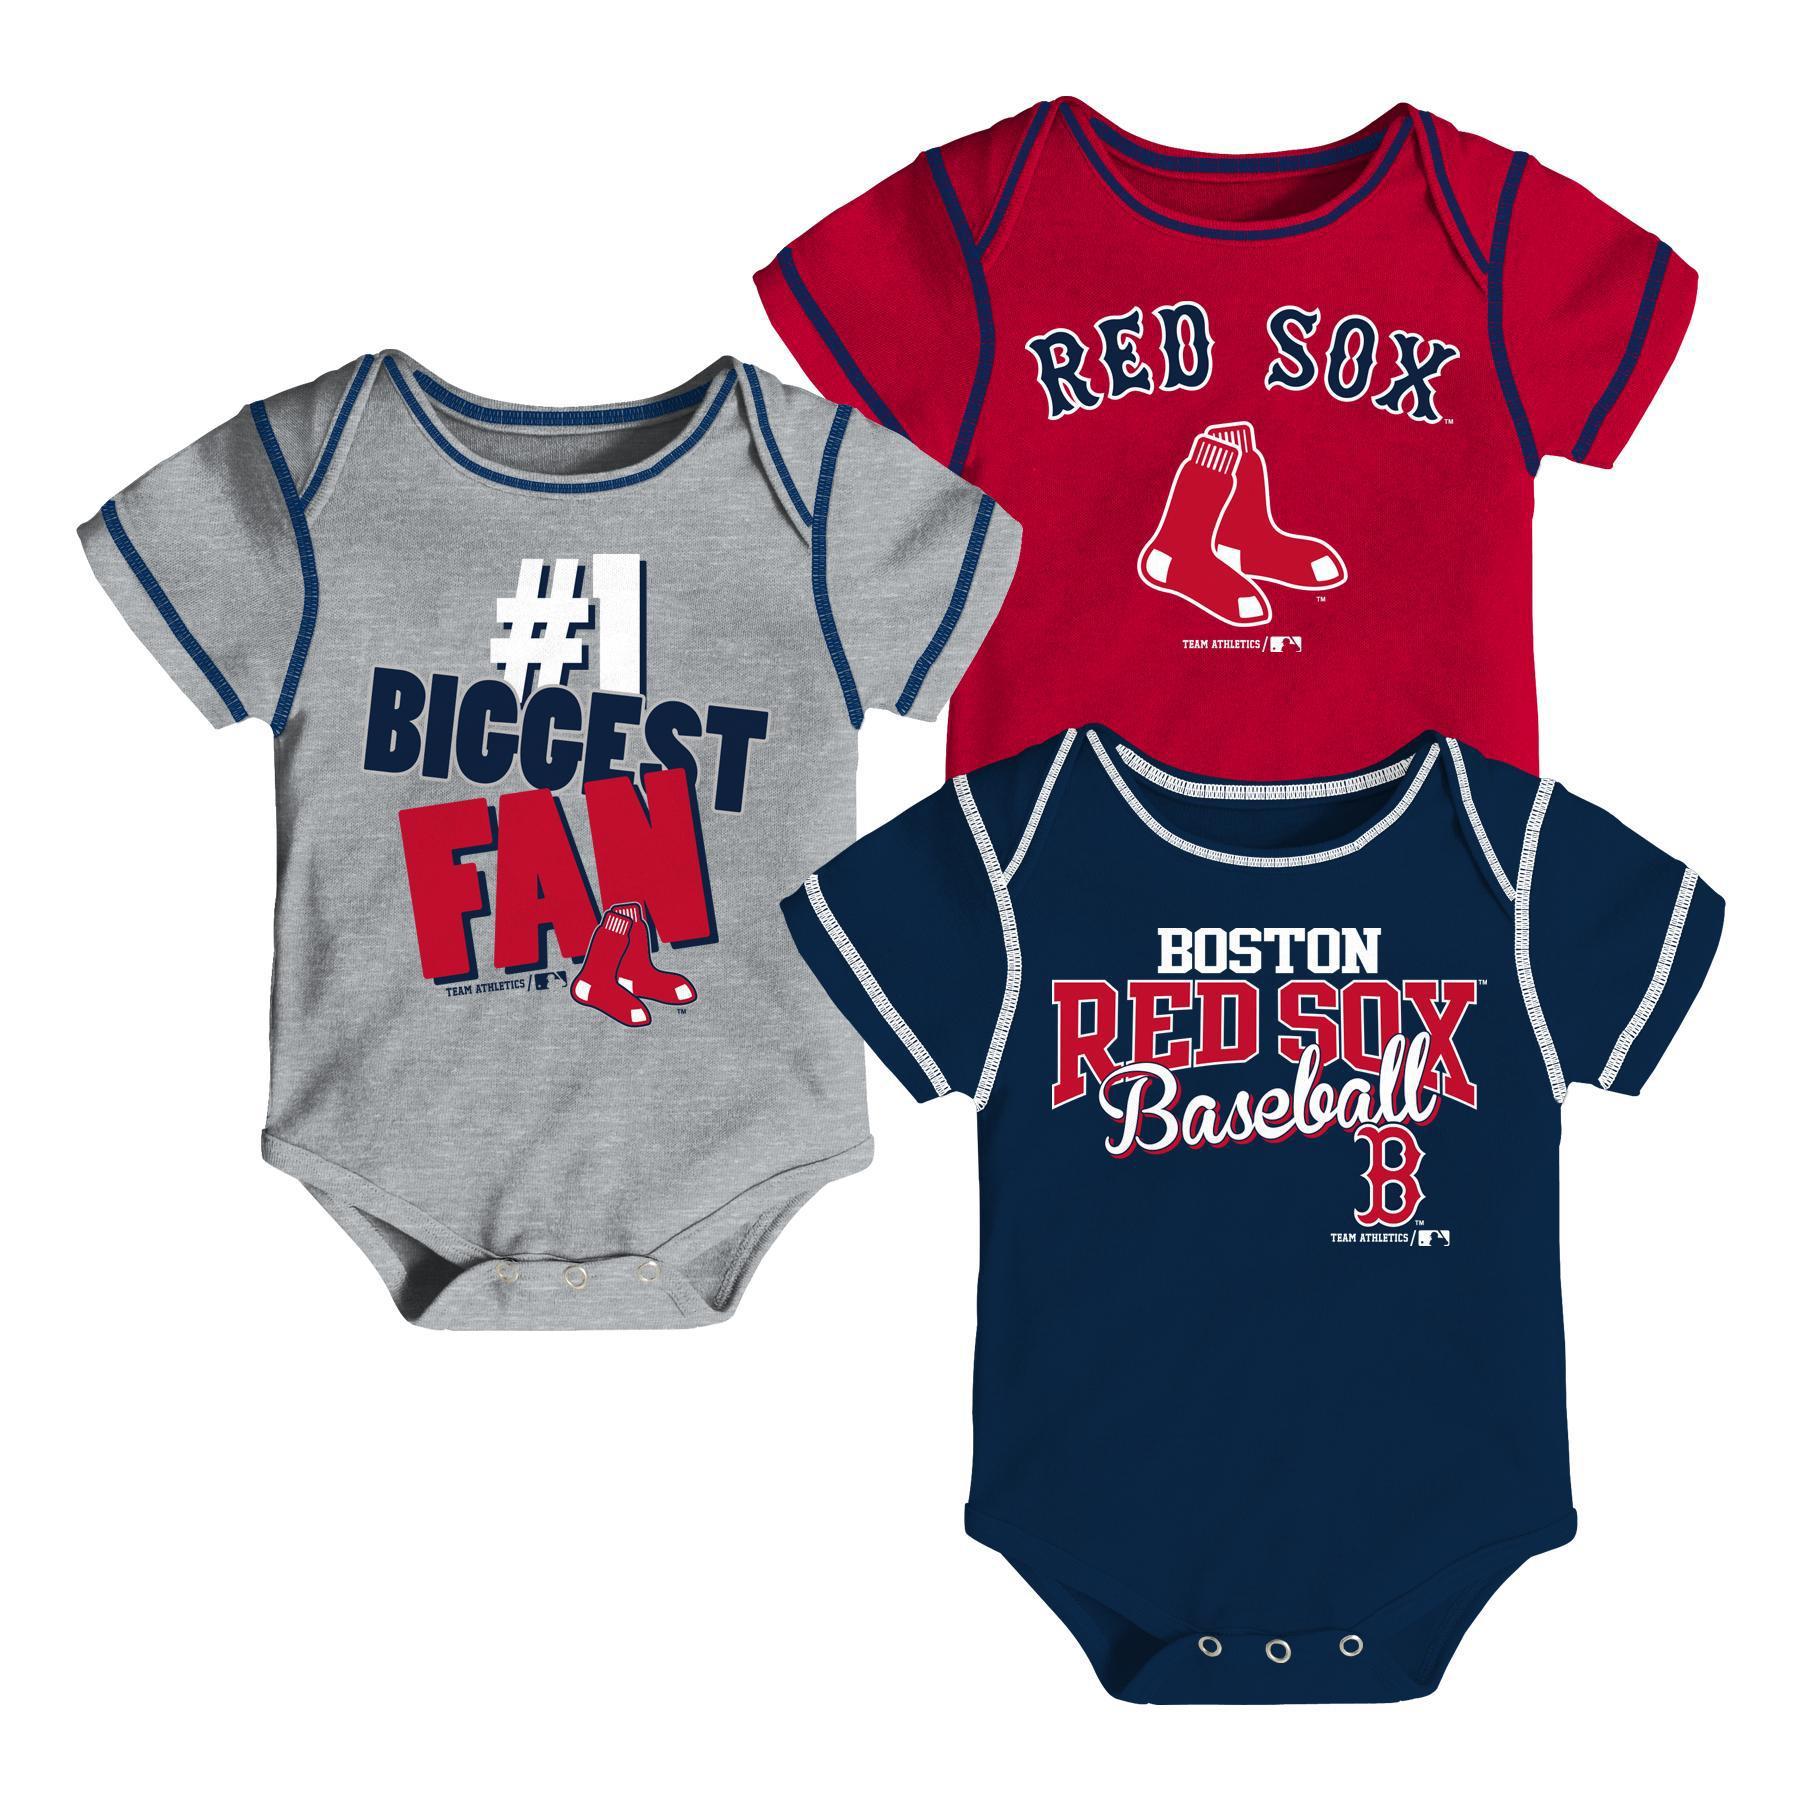 MLB Newborn & Infant Boys' 3-Pack Bodysuits - Boston Red Sox PartNumber: 046VA95229012P MfgPartNumber: 32FB1-12